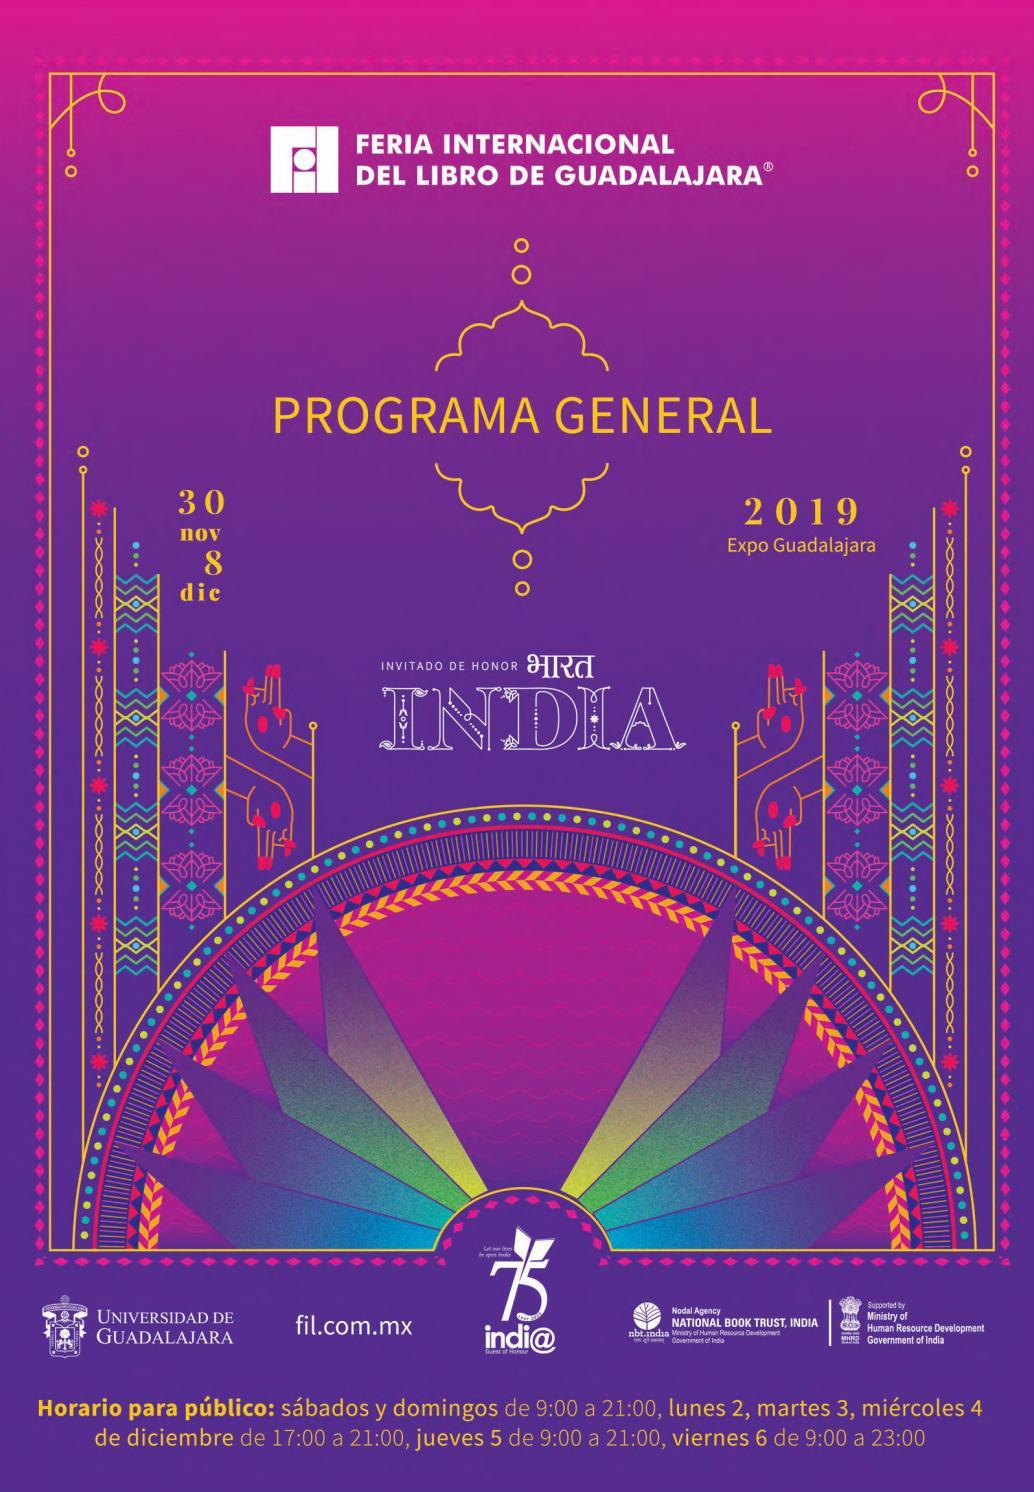 Programa De Mano Fil 2019 By Feria Internacional Del Libro De Guadalajara Fil Issuu